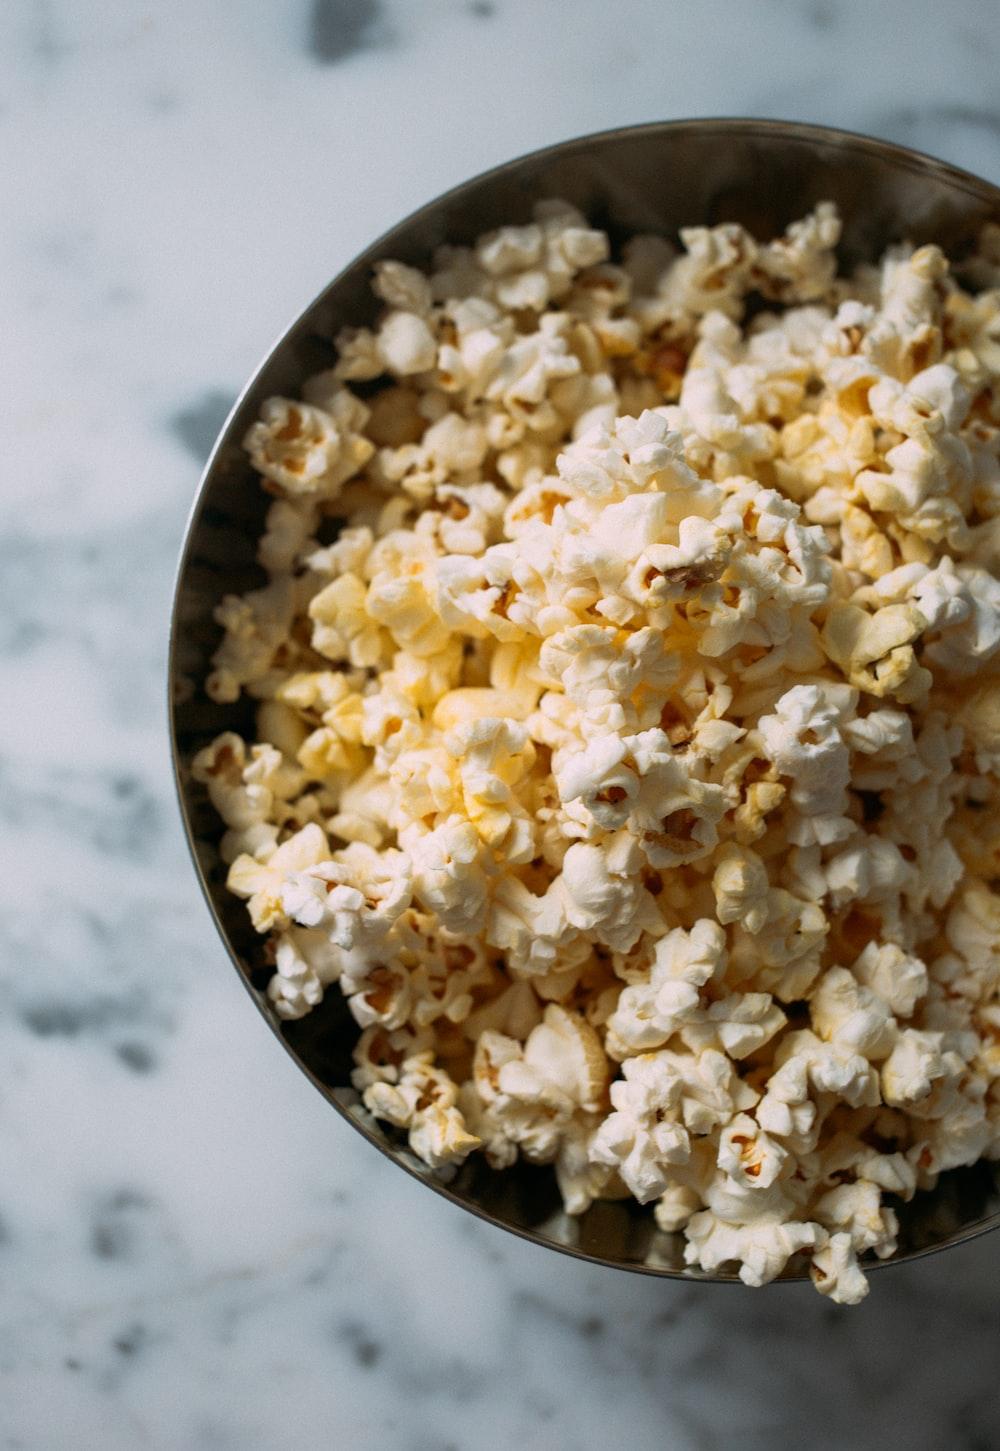 photo of popcorn kernels